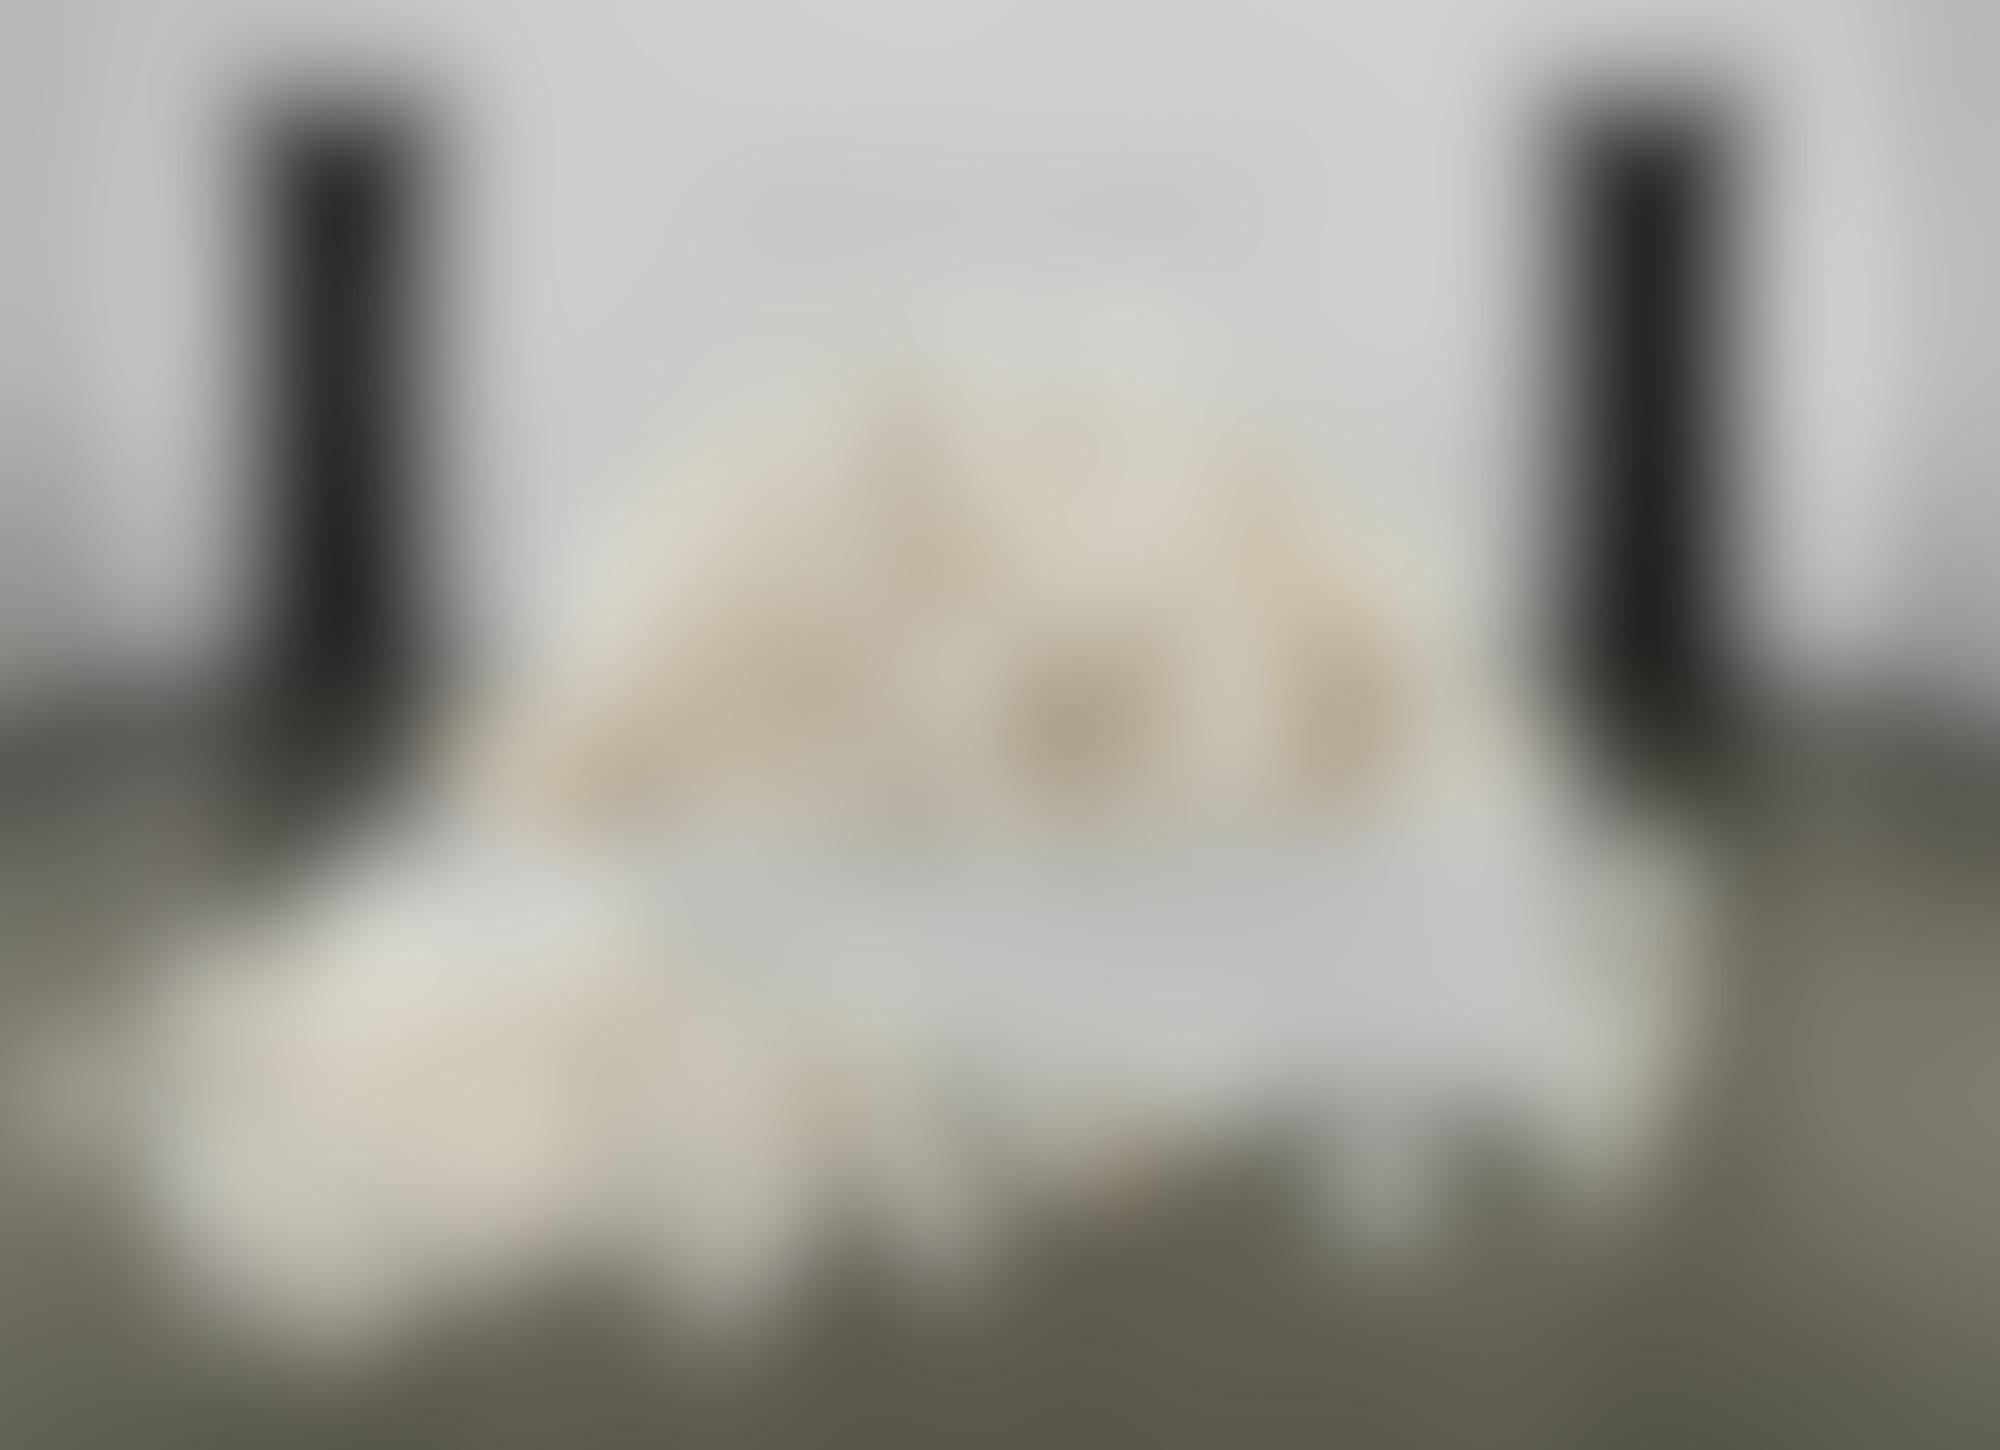 Madethought gfsmithextract 11 1 autocompressfitresizeixlibphp 1 1 0max h2000max w3 D2000q80s28af12f196147778622b3f45904b9f71